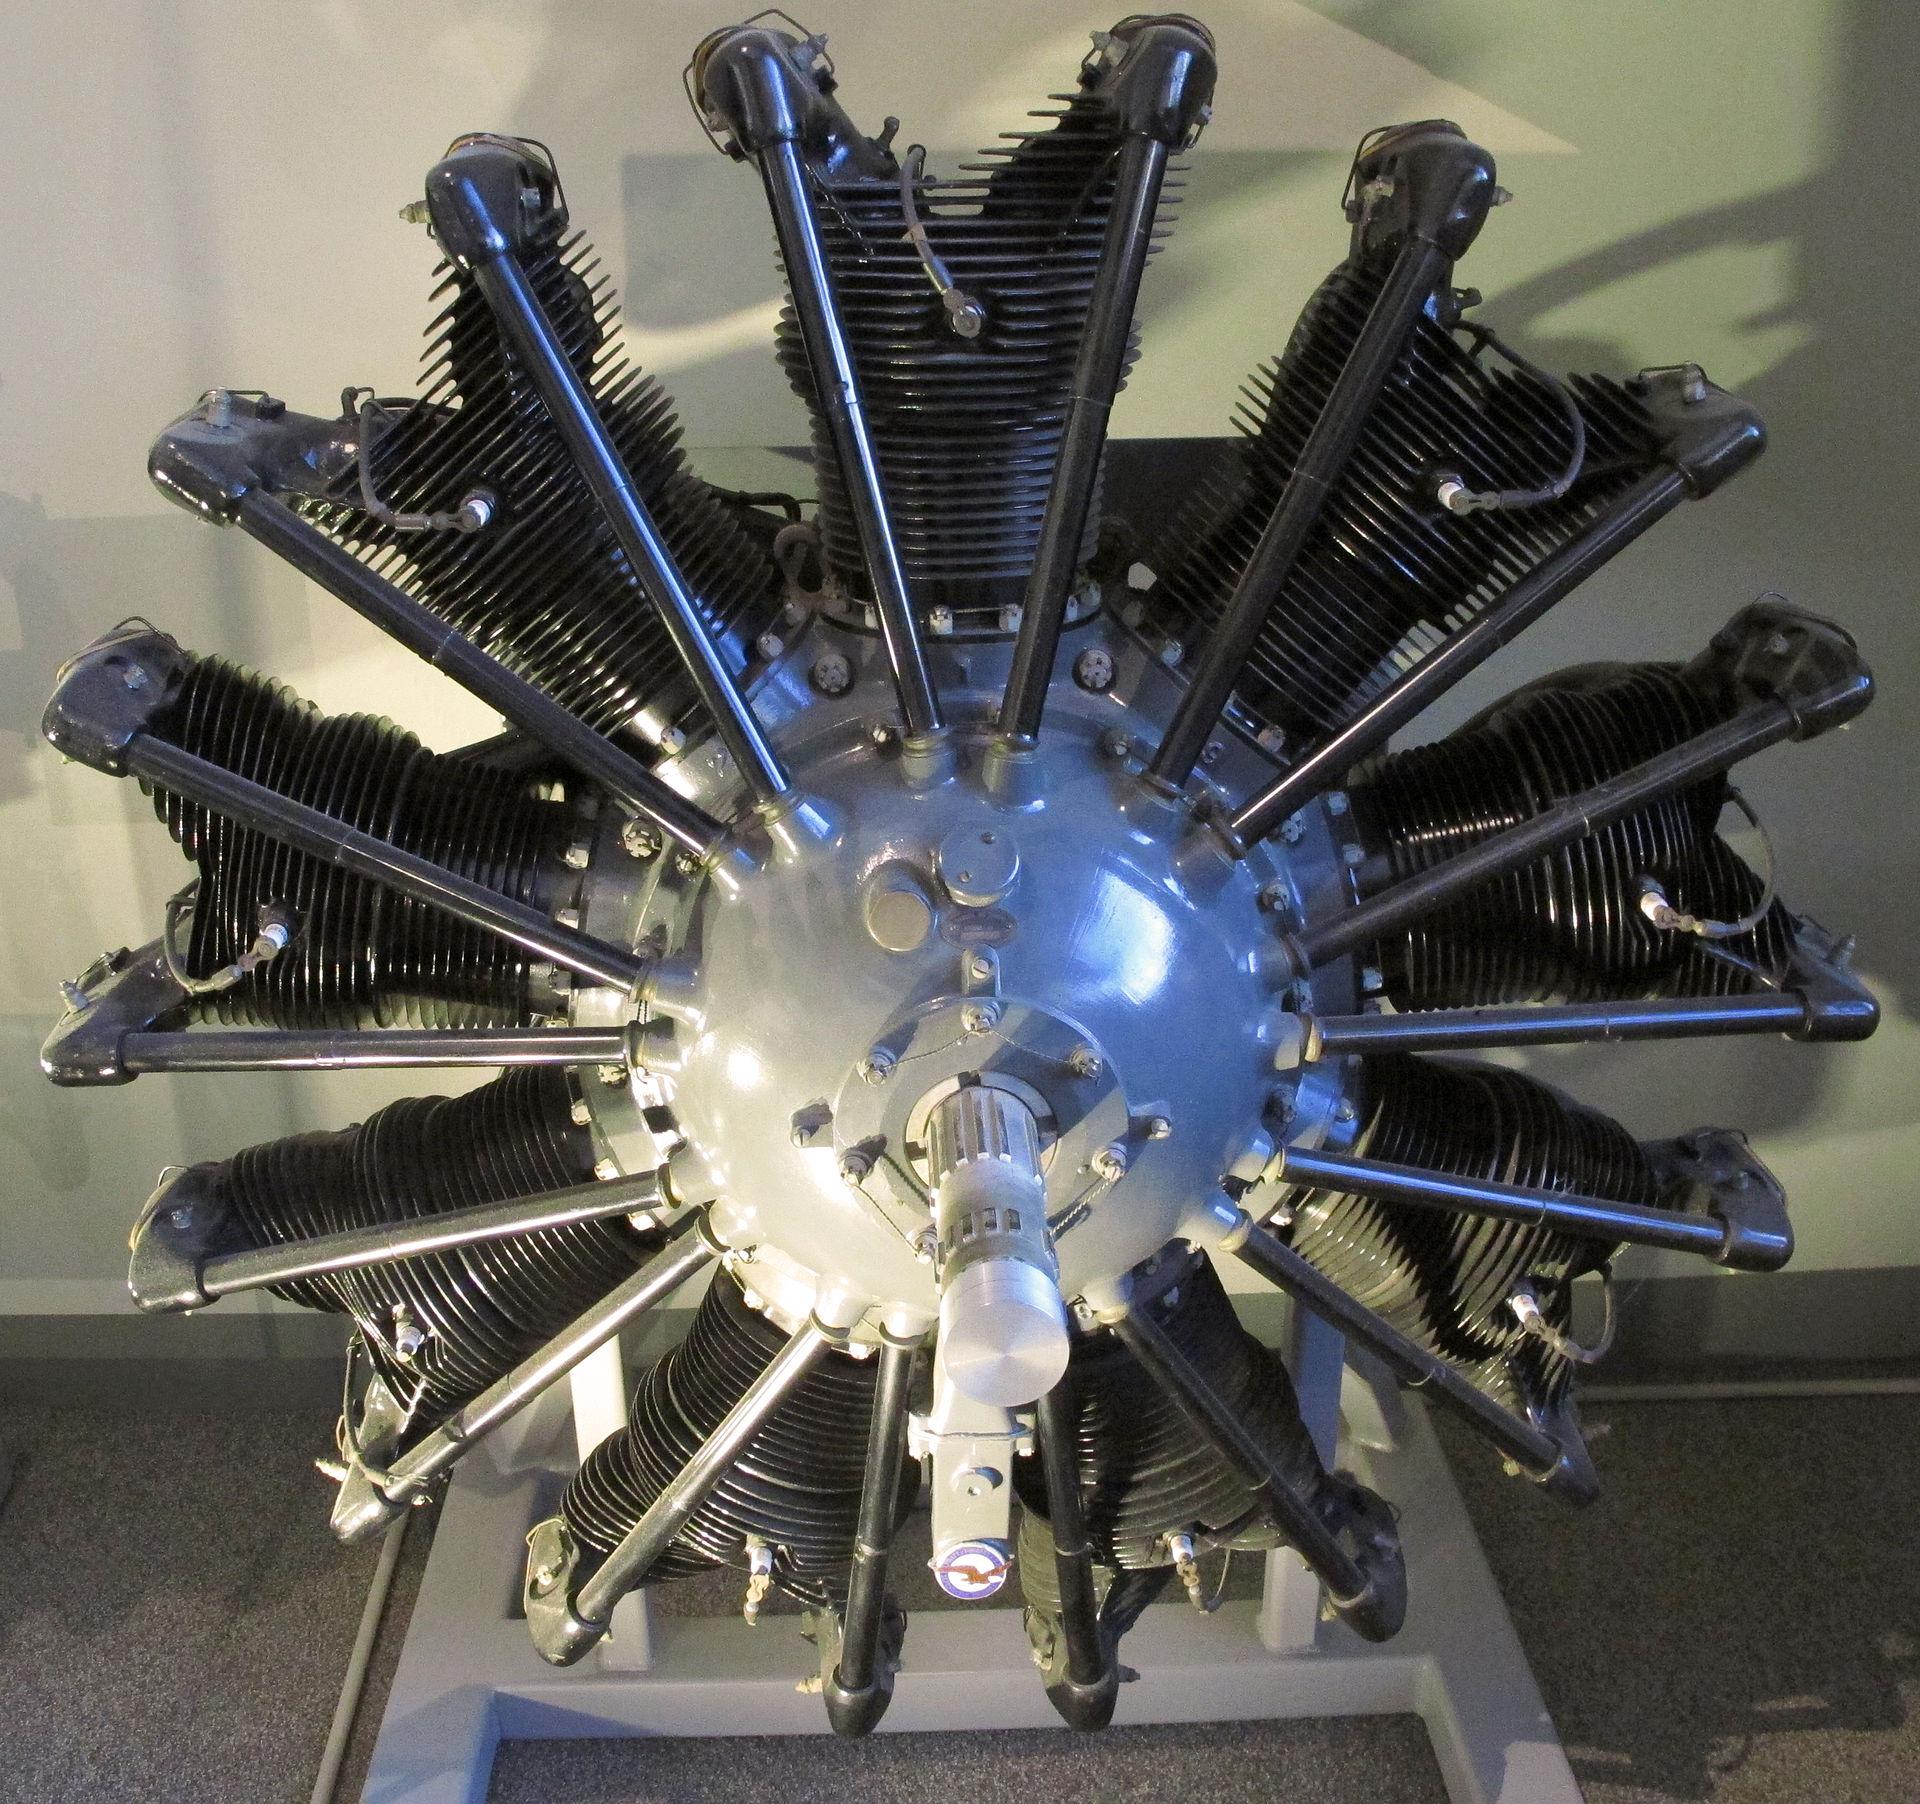 Pratt & Whitney R-1340 Wasp - Wikipedia